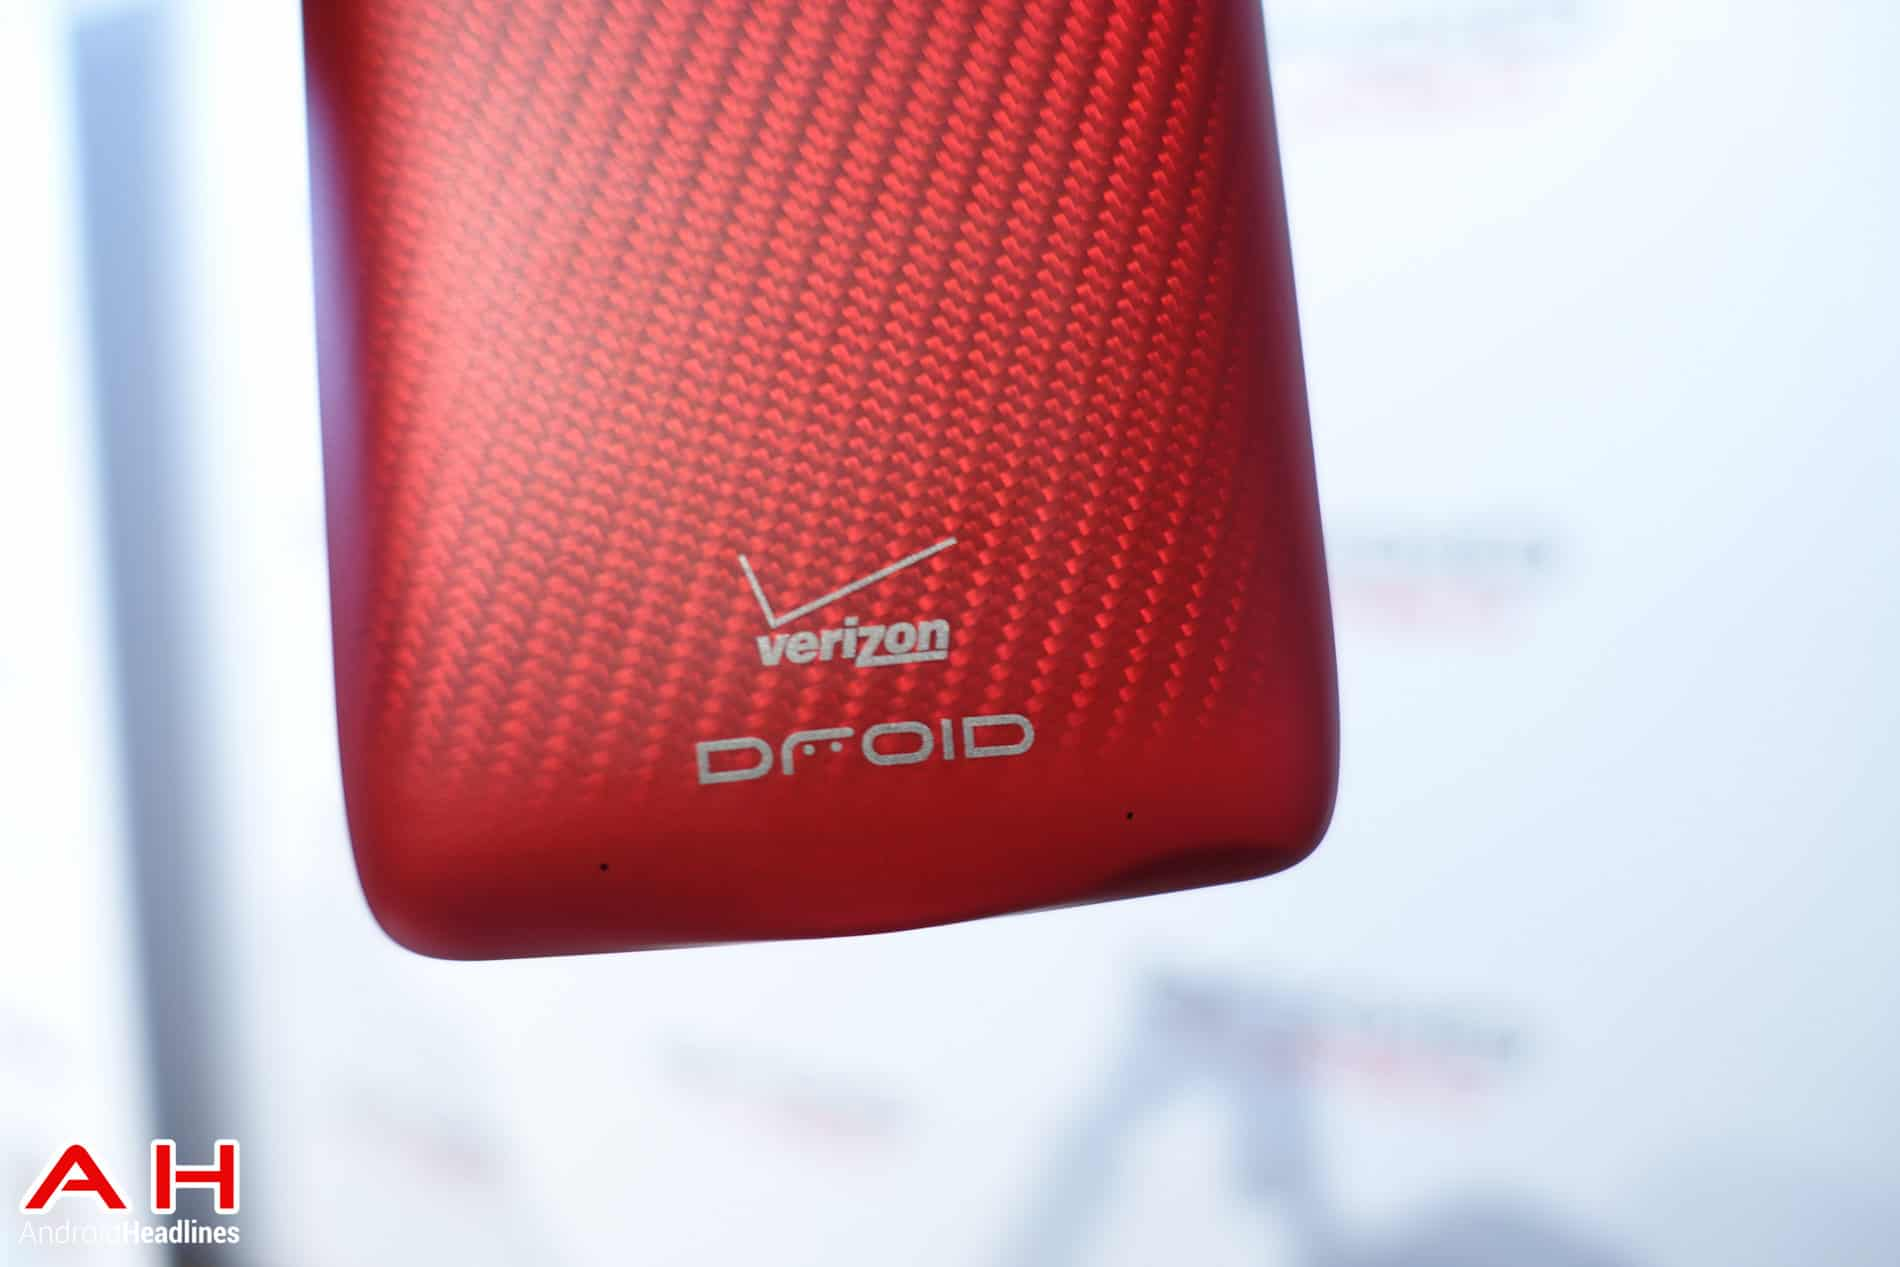 Verizon DROID Turbo AH 5